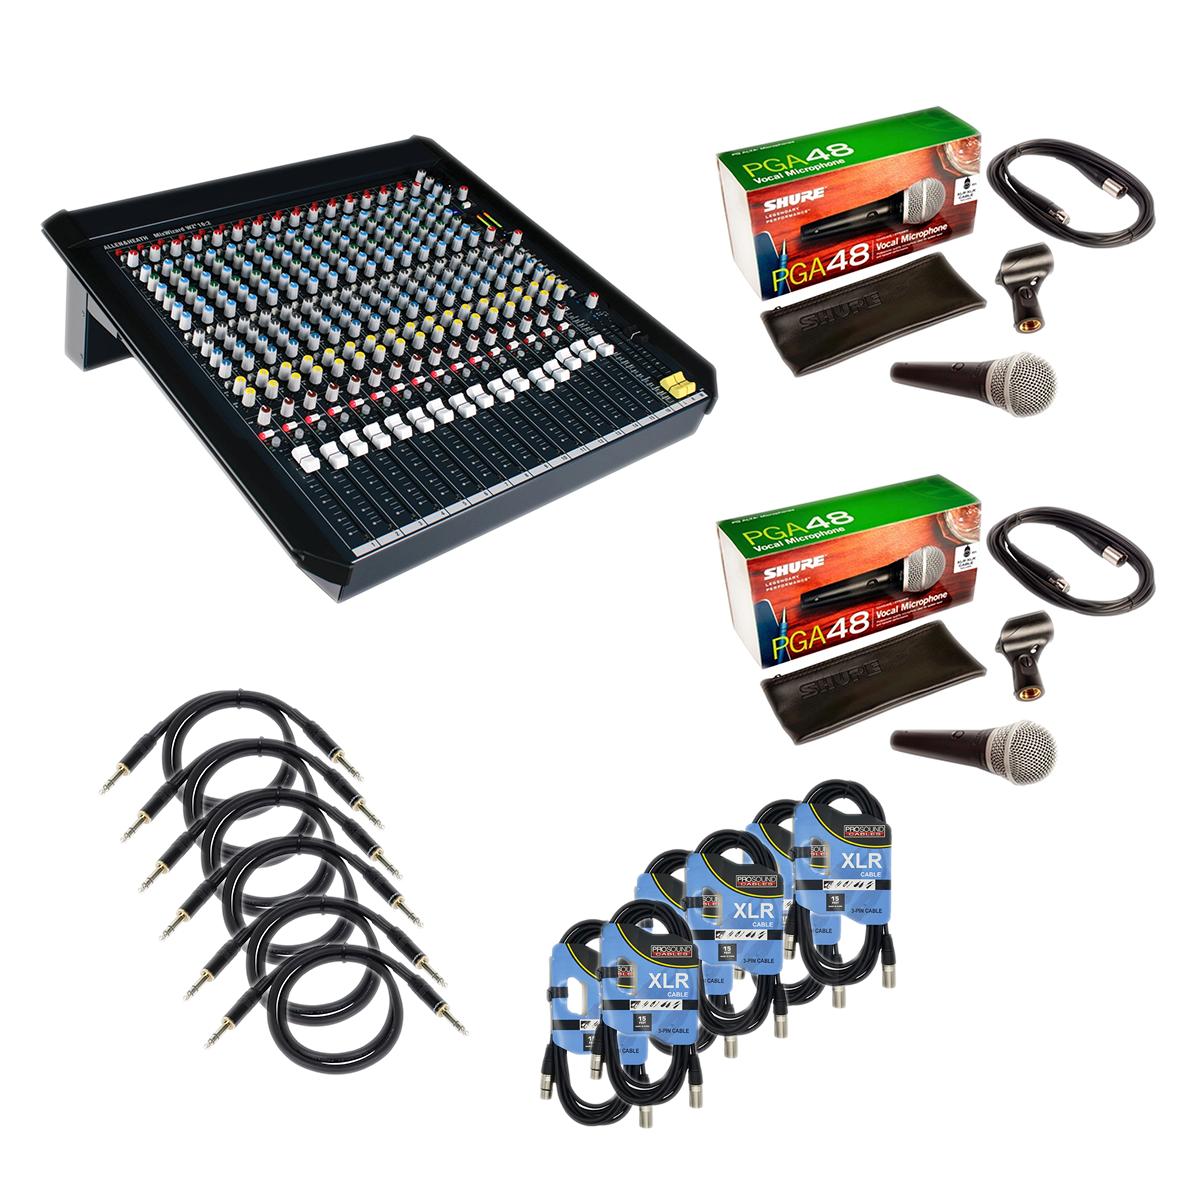 -4 Allen & Heath MixWizard4 WZ416-2 - 6 XLR Cables - 6 1:4 Cable - (2) PG48 - $1249.99